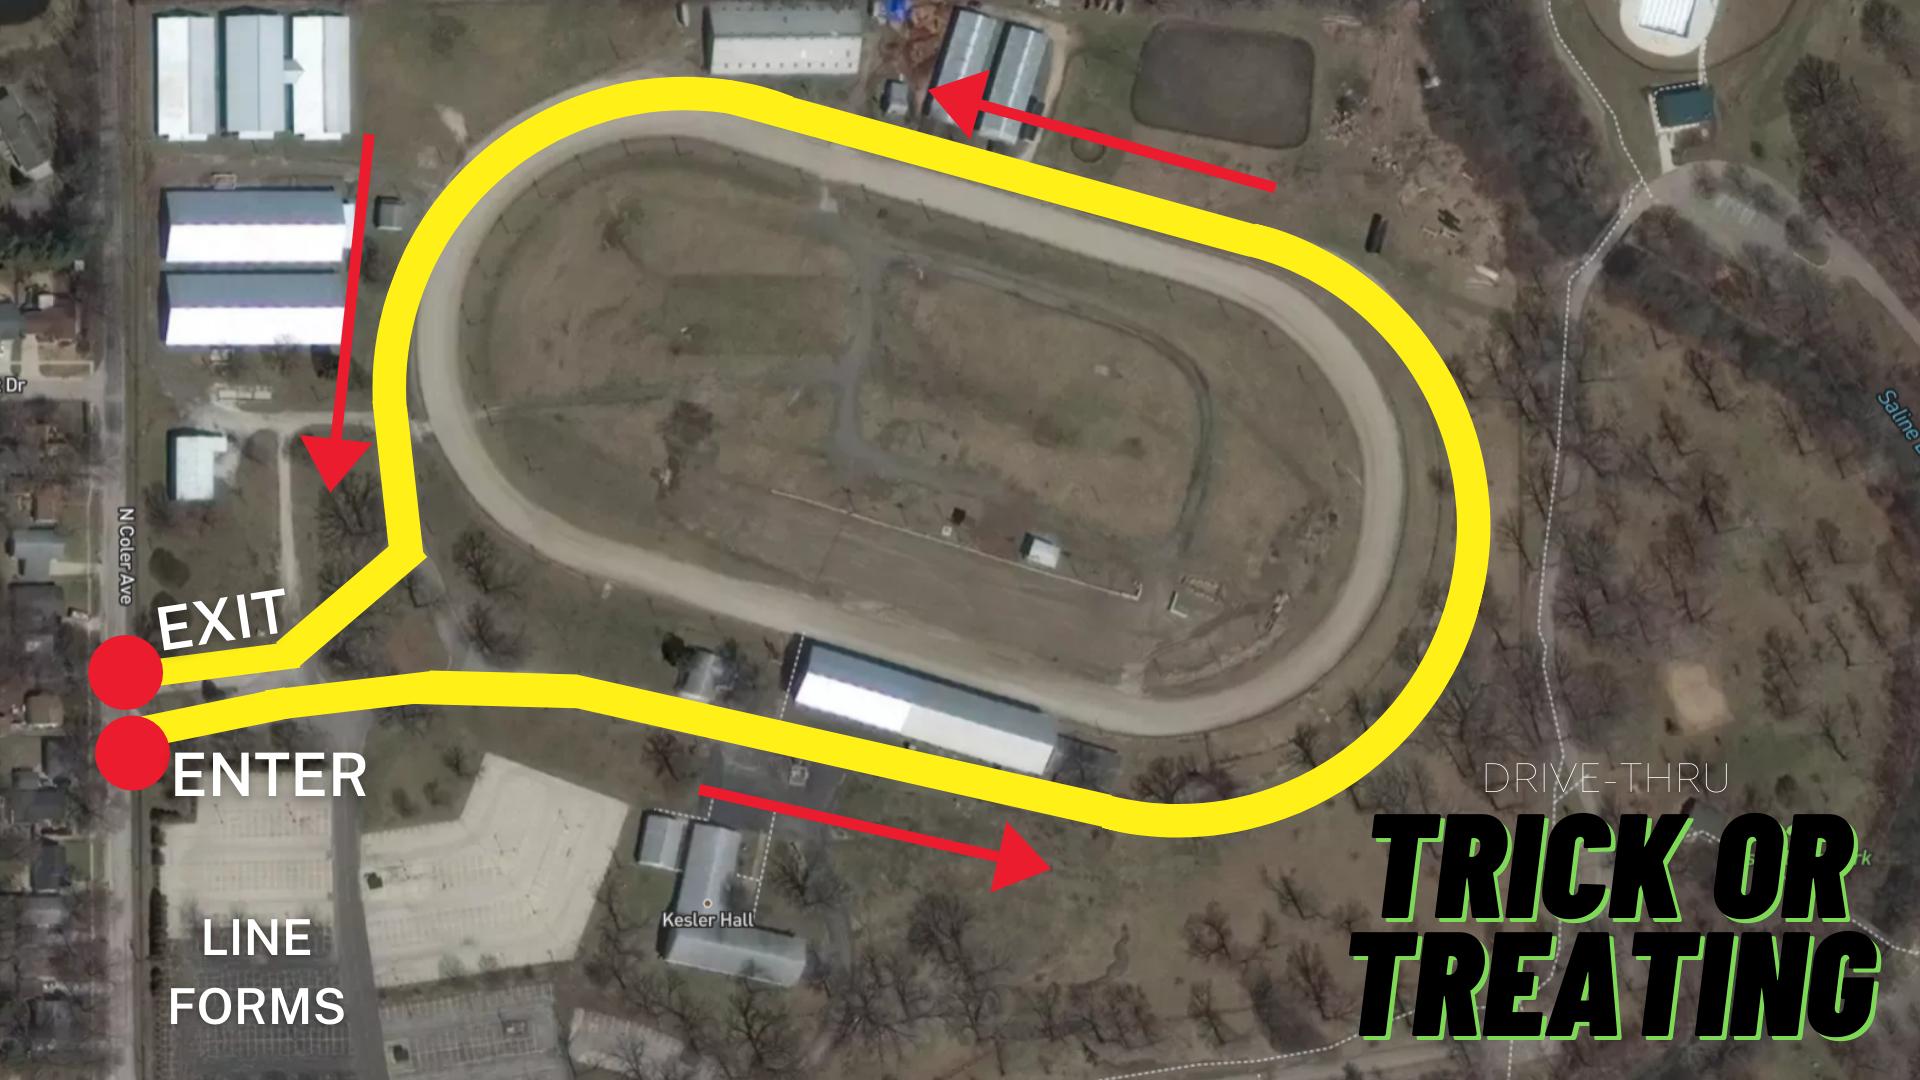 Drive Thru Trick or Treating Map